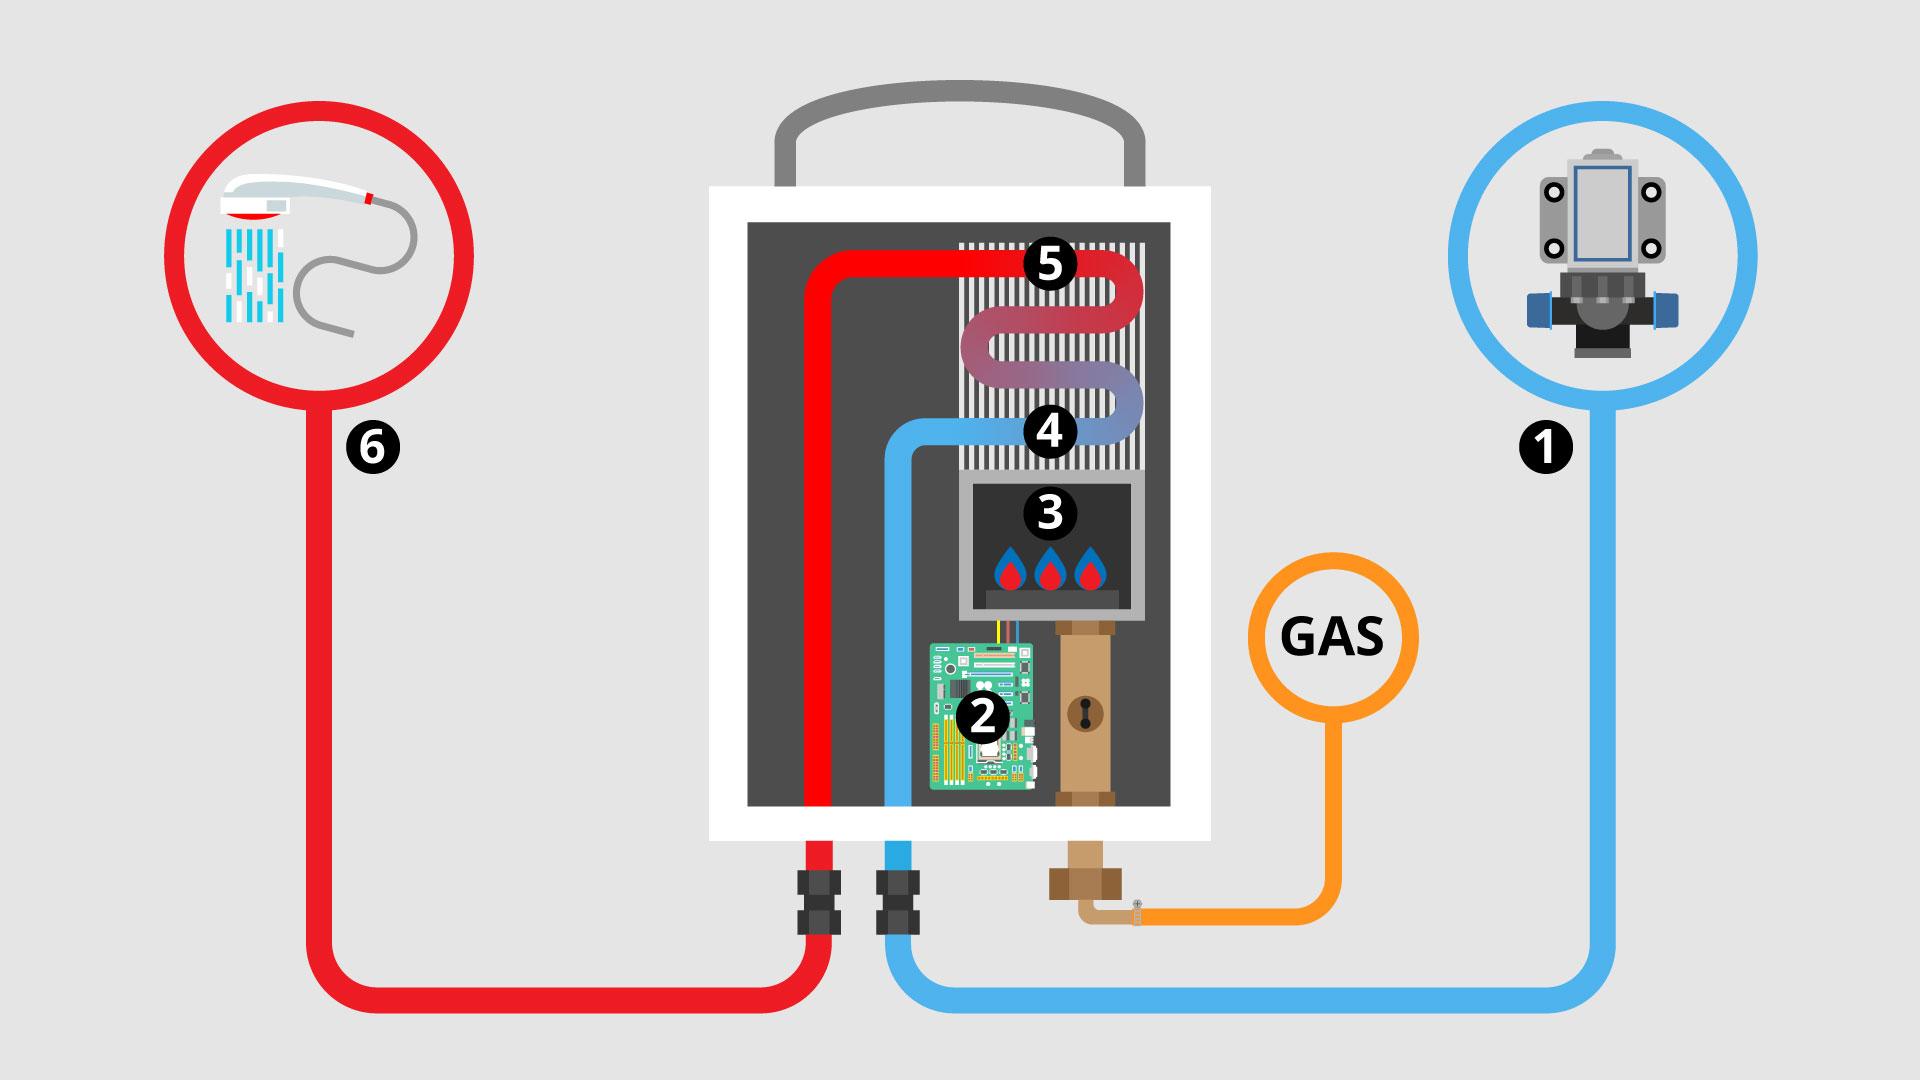 Inside An LPG Gas Water Heater Showing How It Works